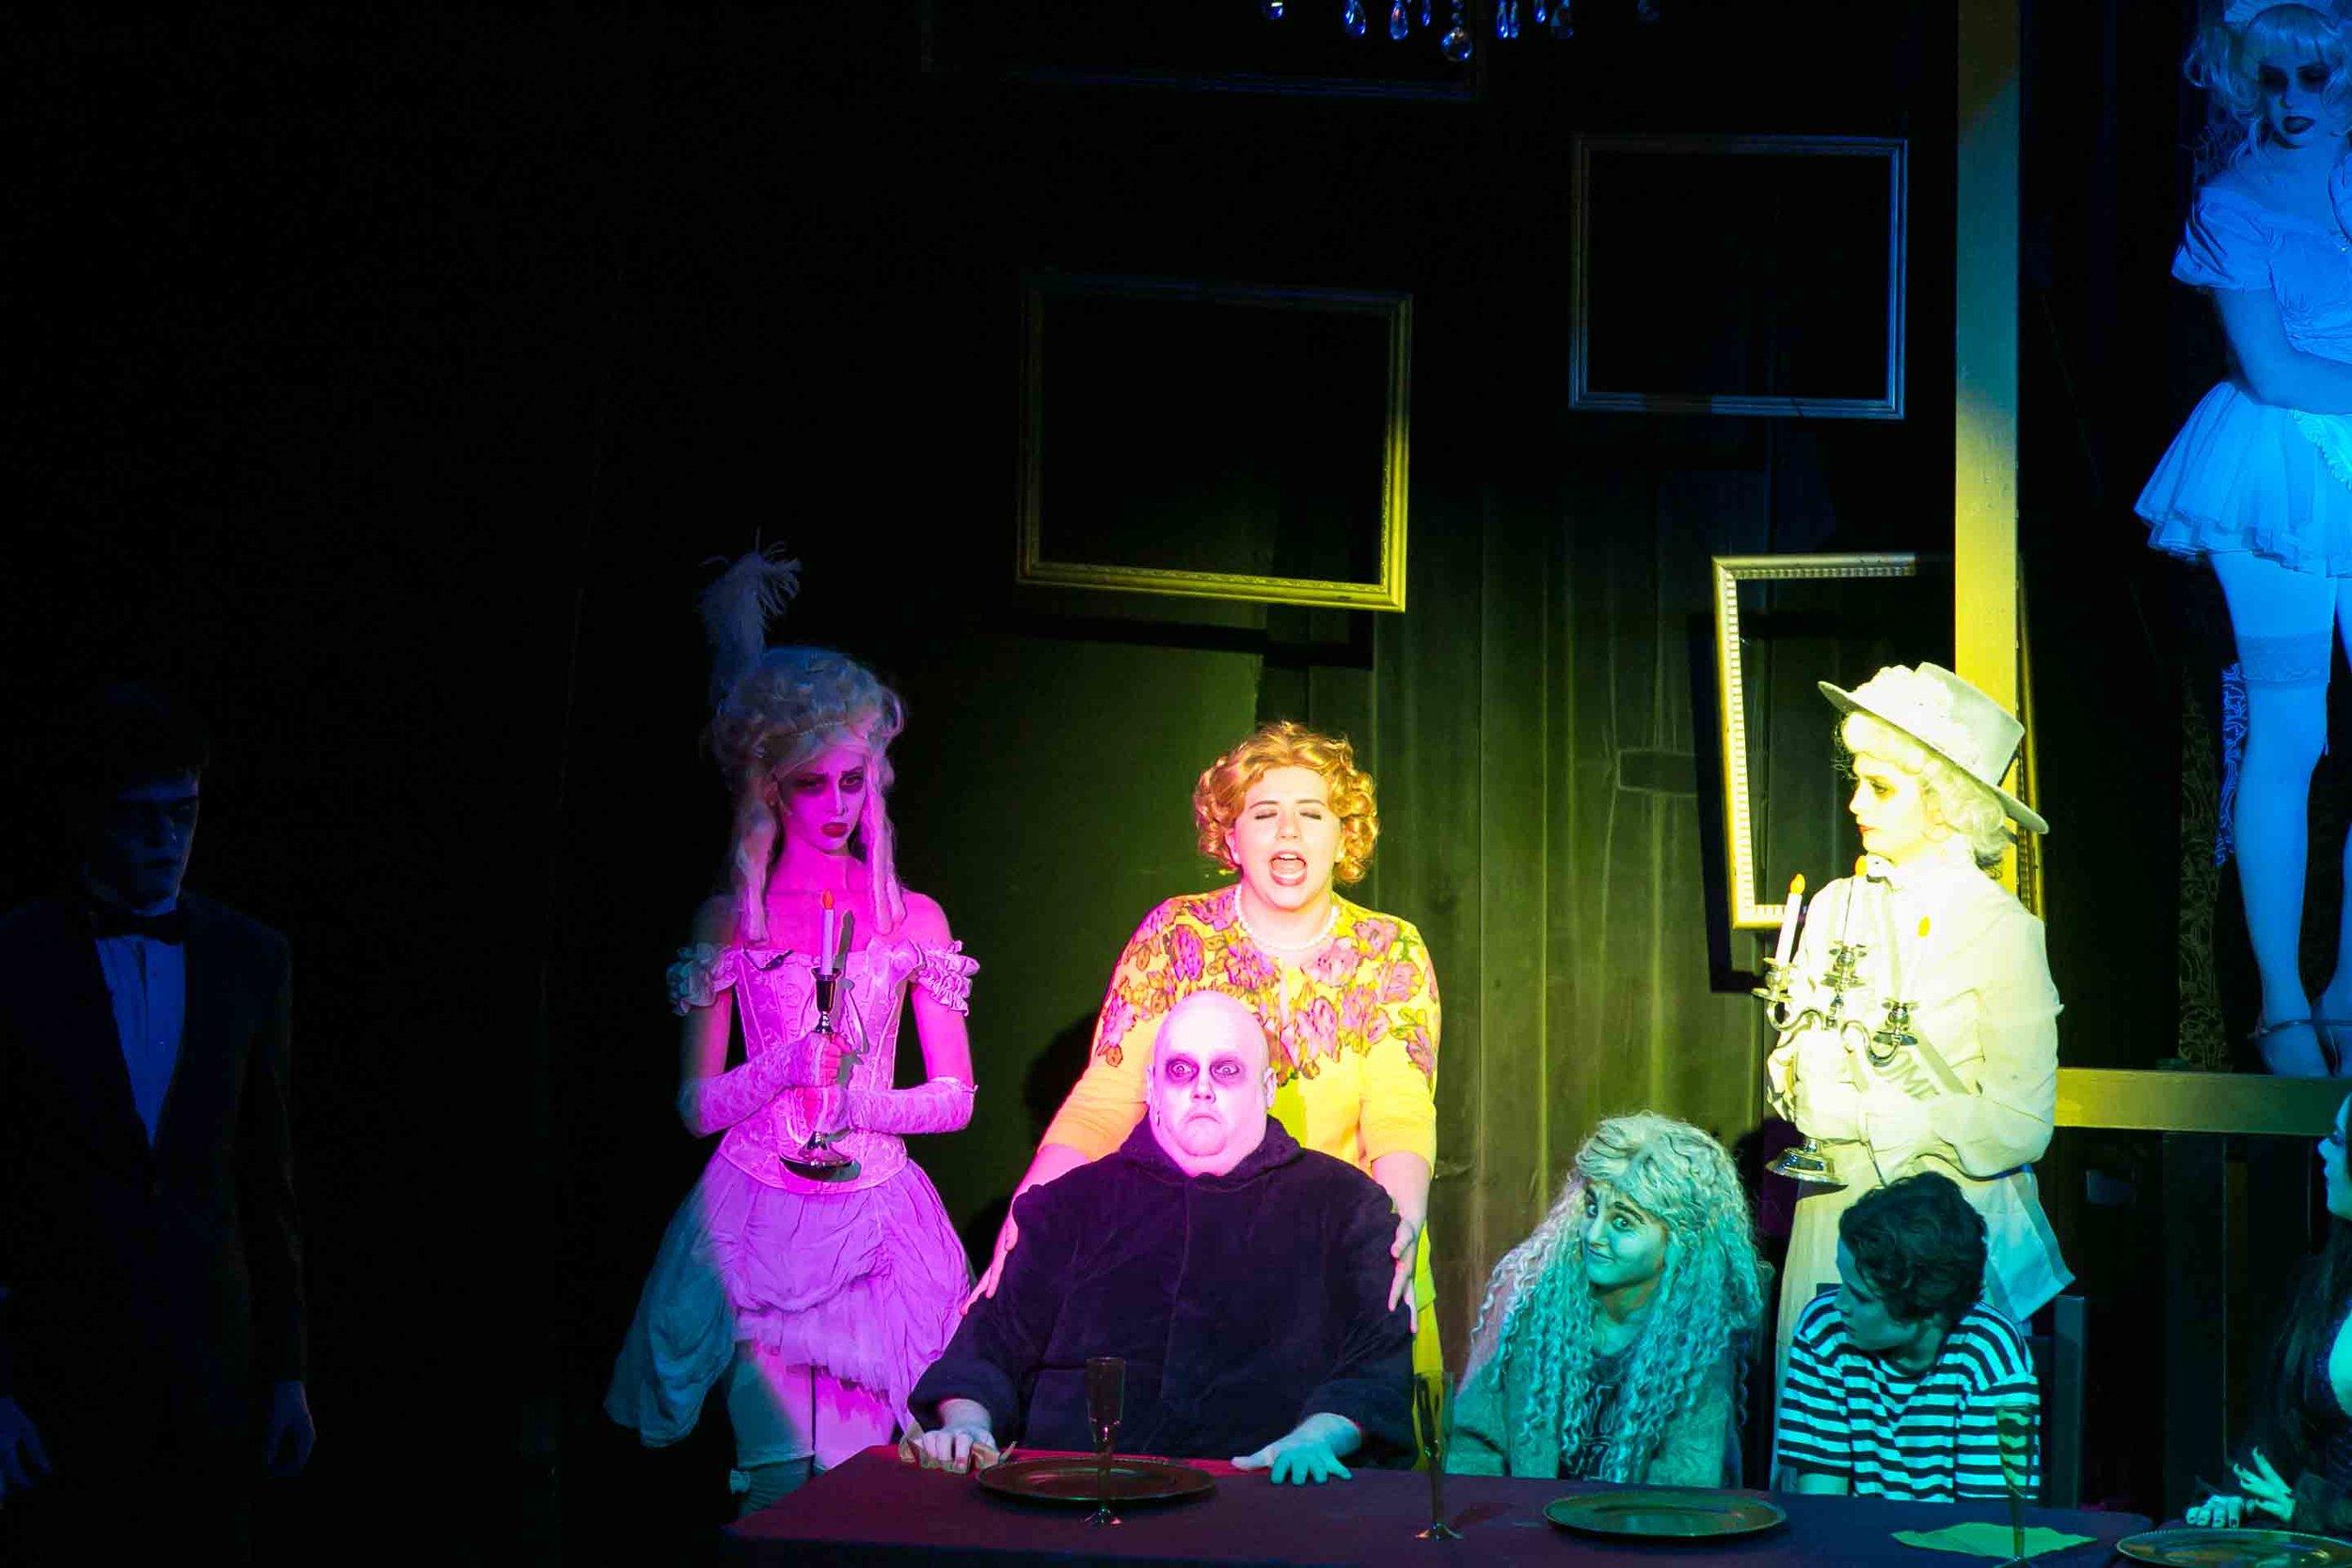 6-19-16 Addams Family Creepy Cast 0198.jpg